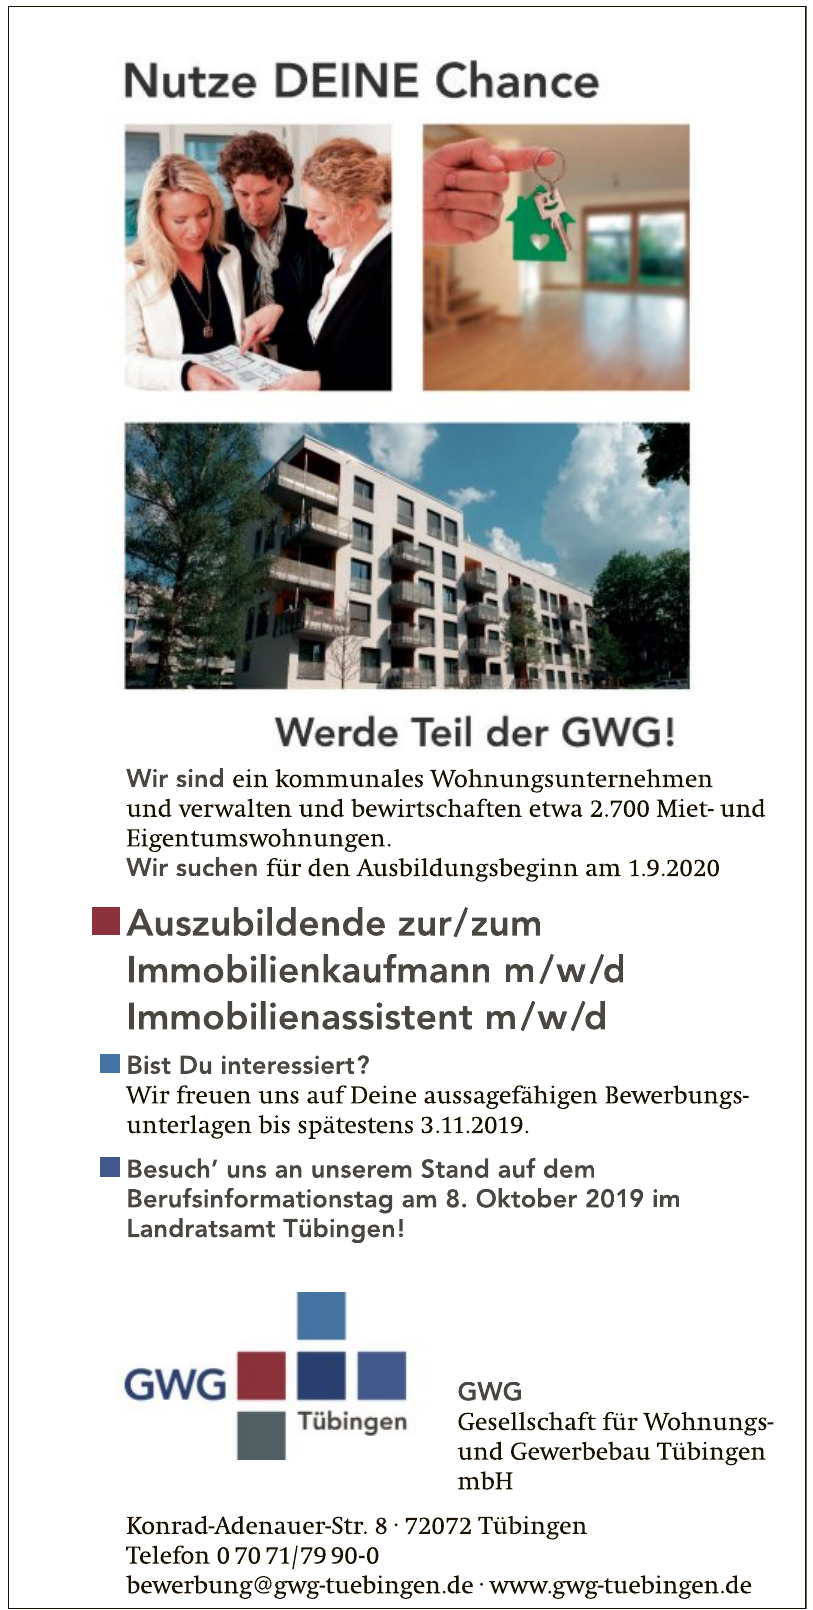 GWG Tübingen mbH